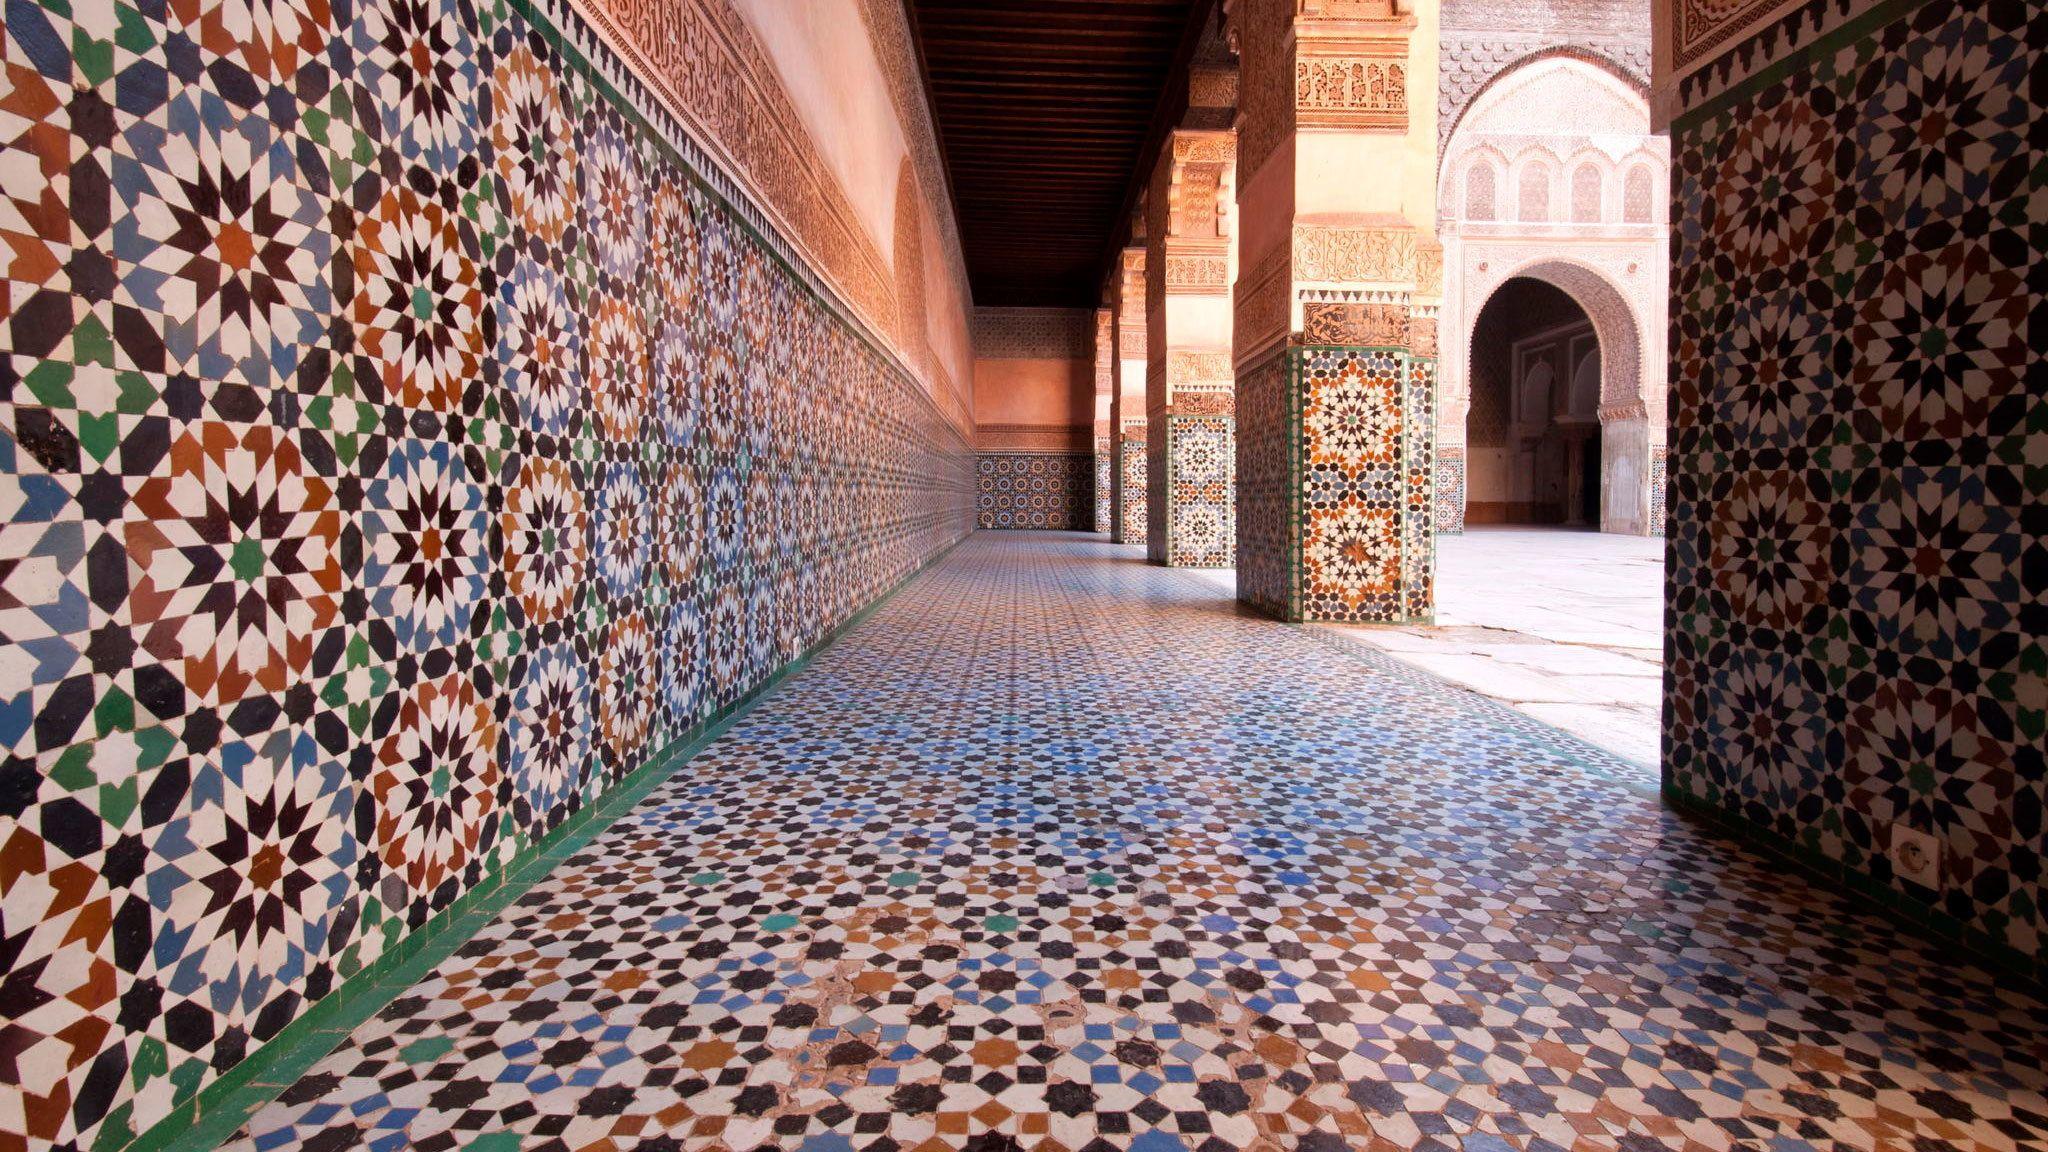 Decorated hallway within El Bahia Palace